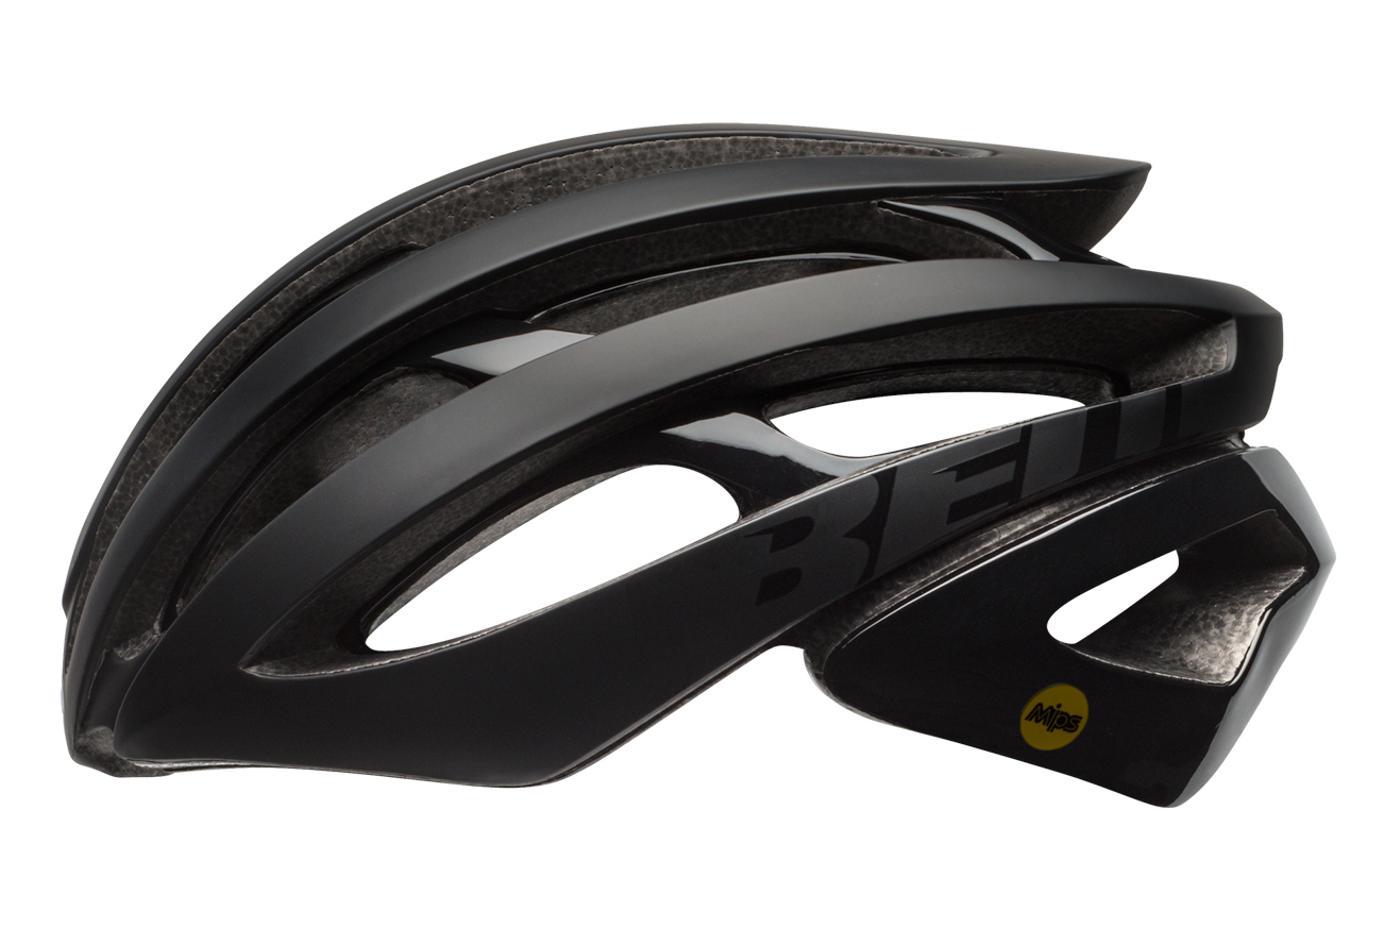 Bell's New Zephyr Helmet